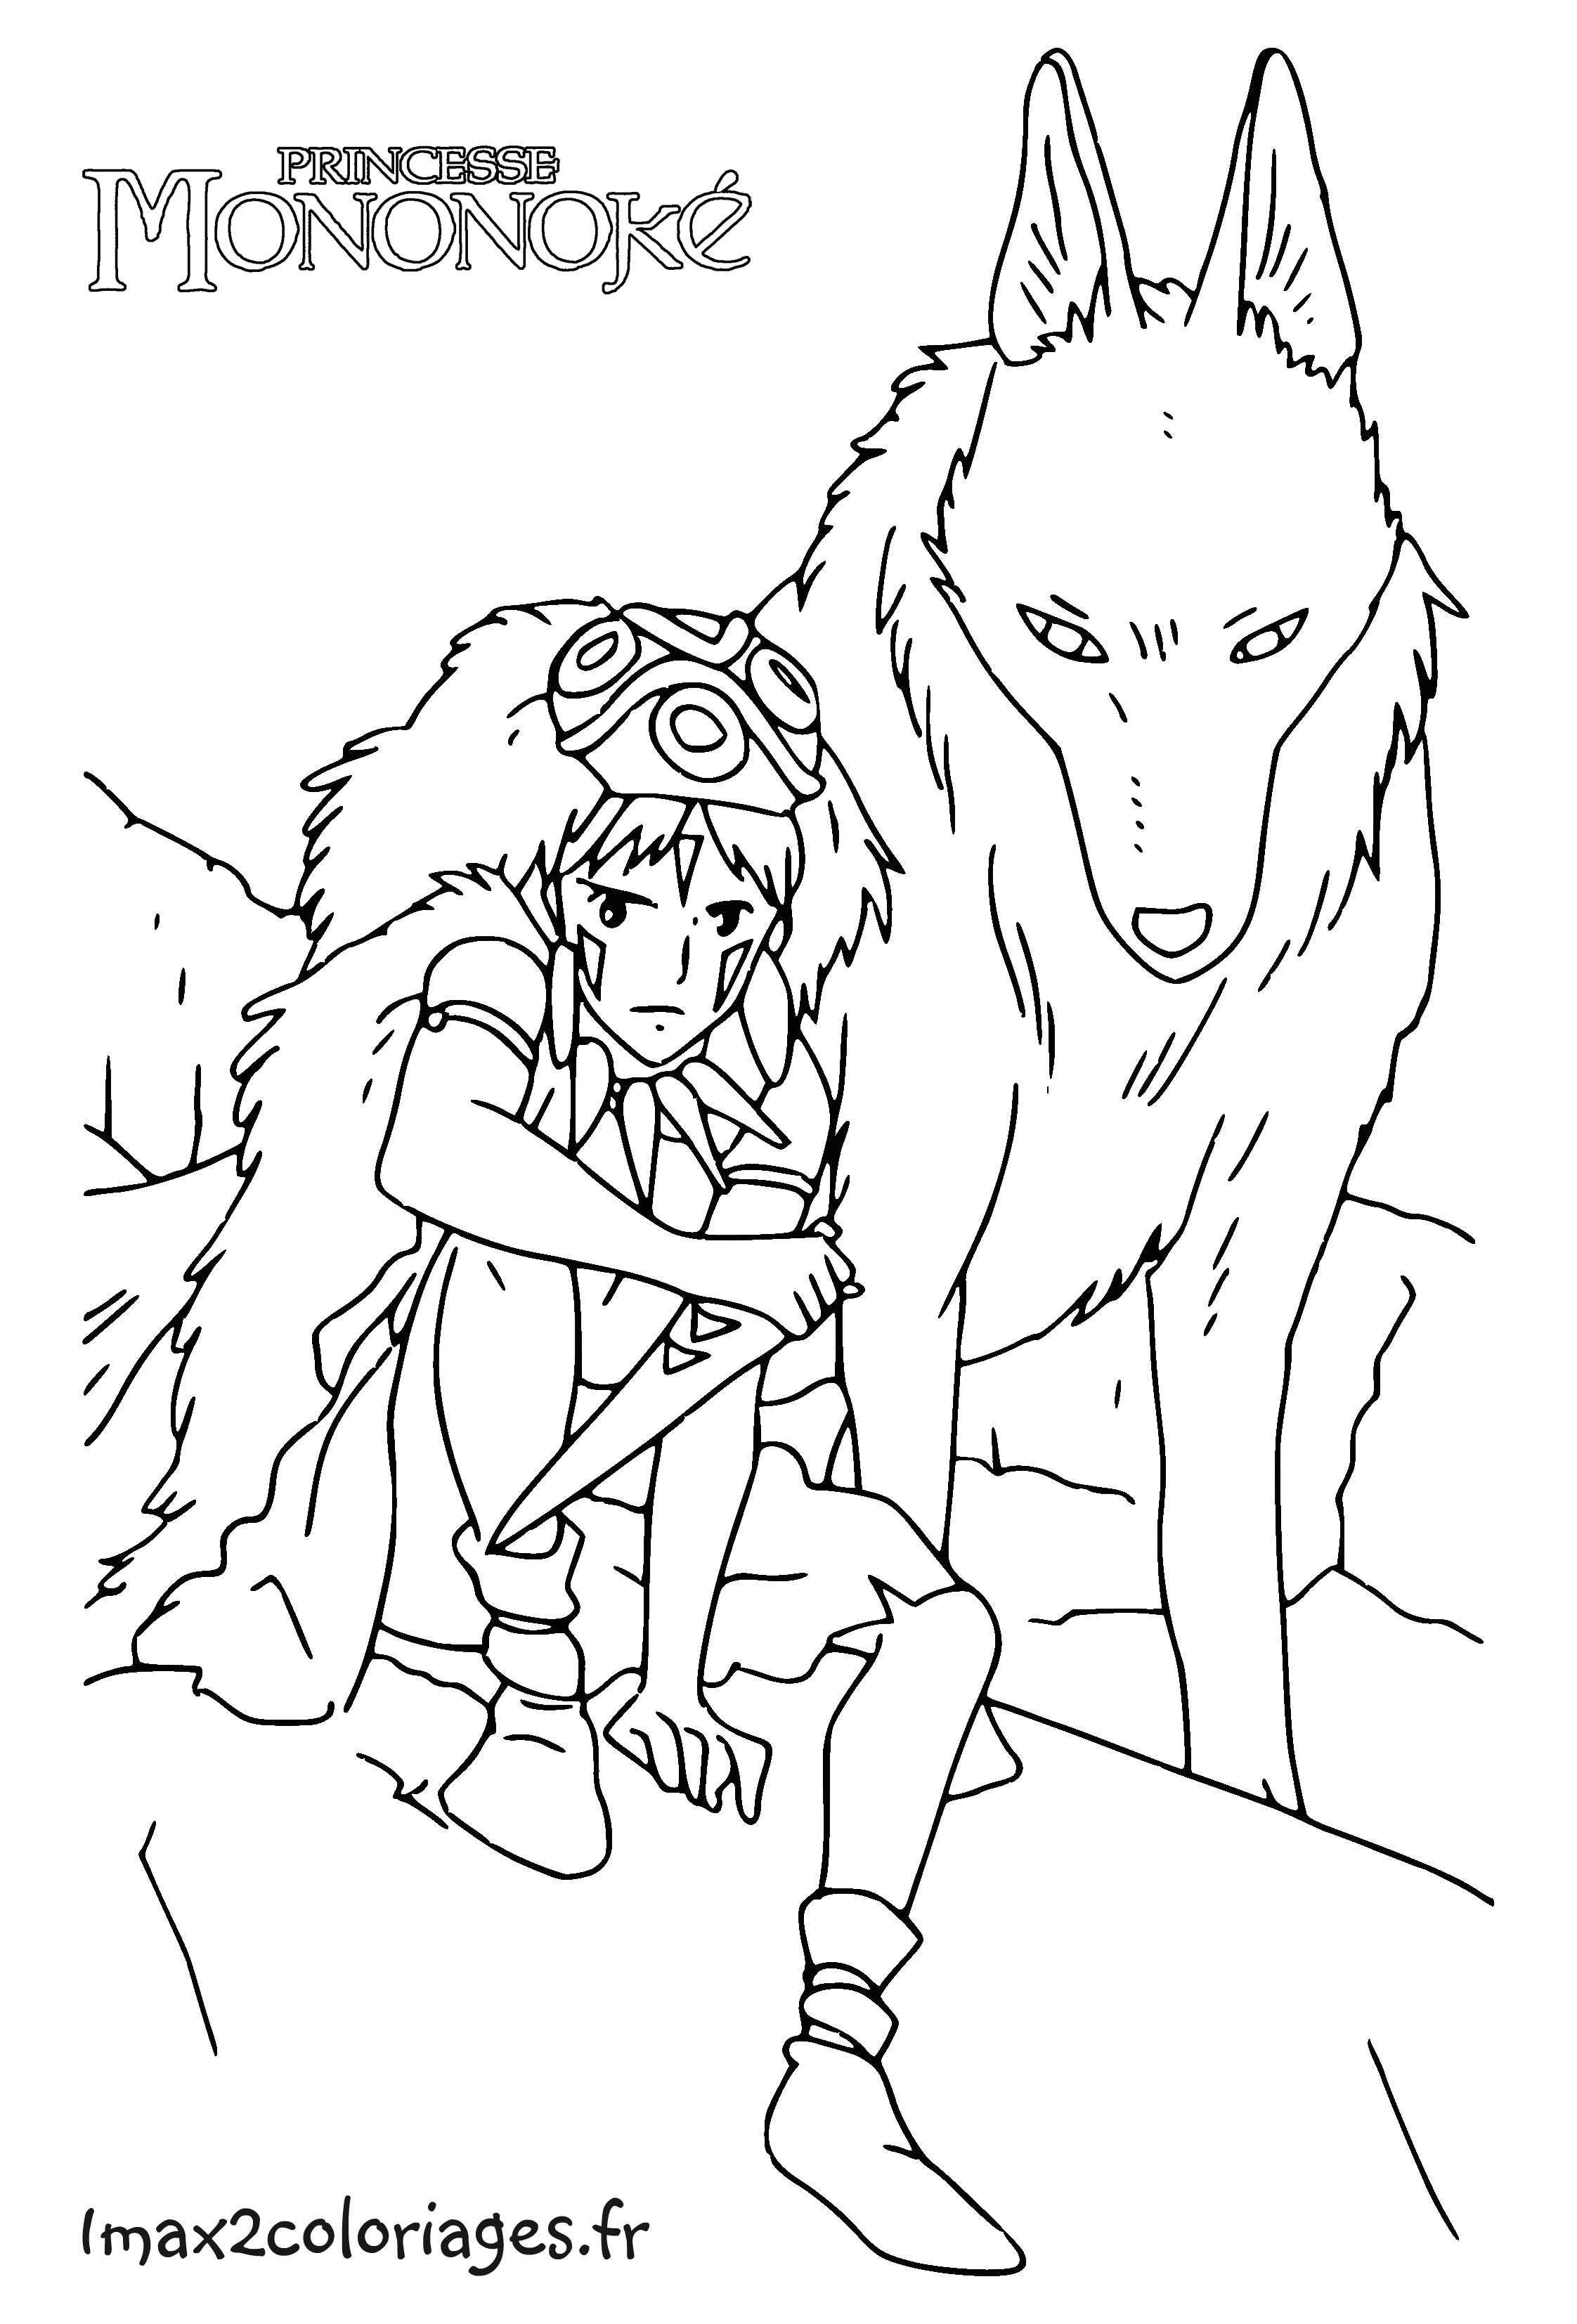 Coloriages des films miyasaki des studios ghibli for Kiki s delivery service coloring pages